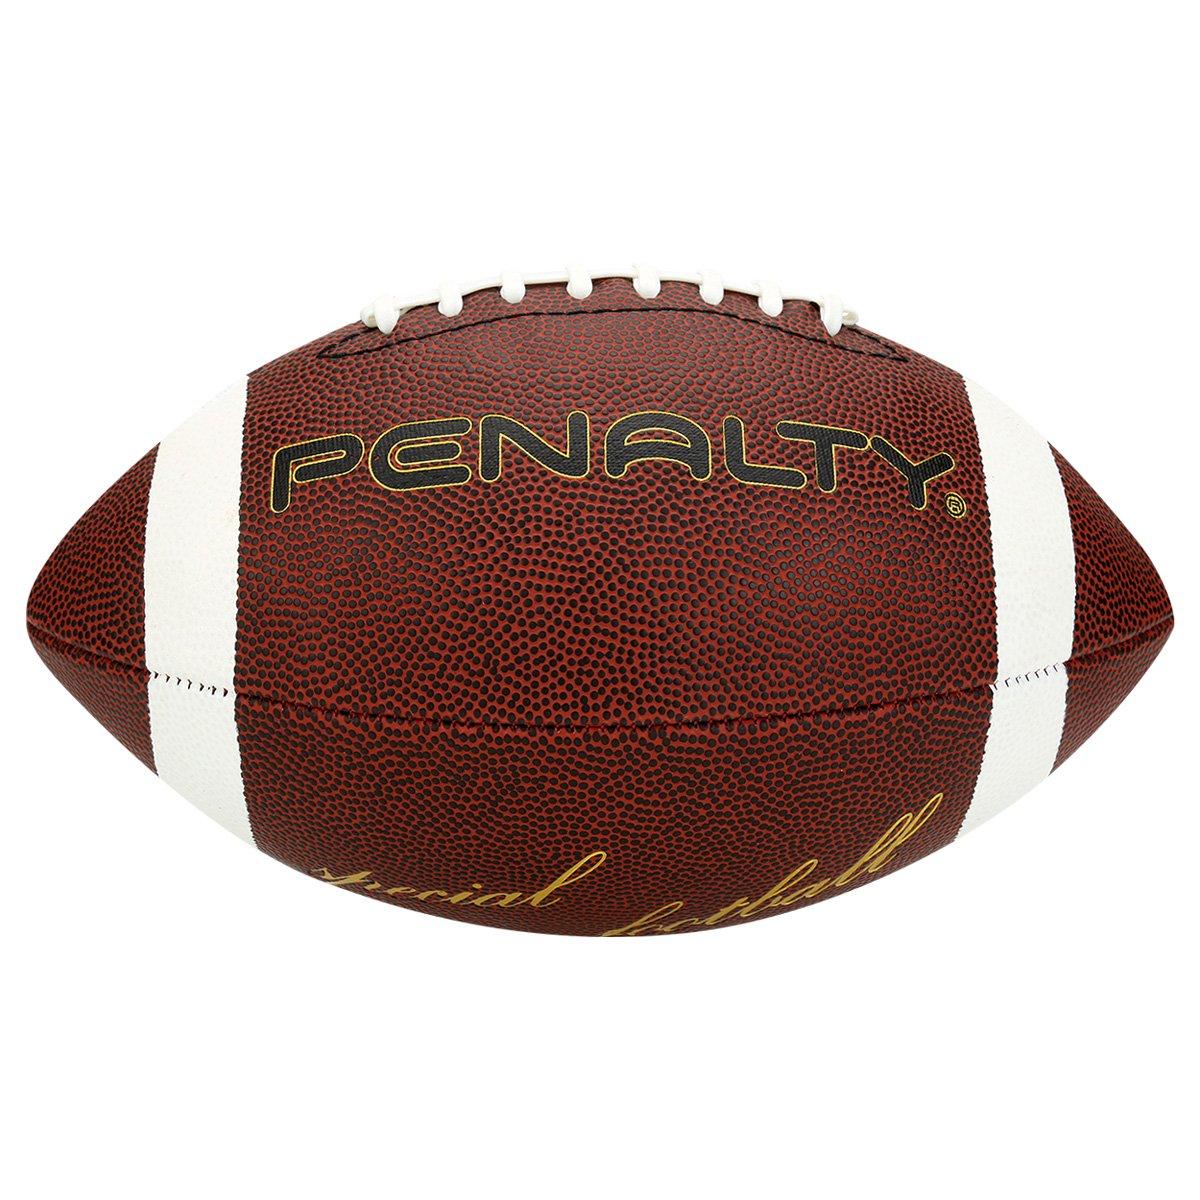 Bola Futebol Americano Penalty  Bola Futebol Americano Penalty 78906adca4dc9